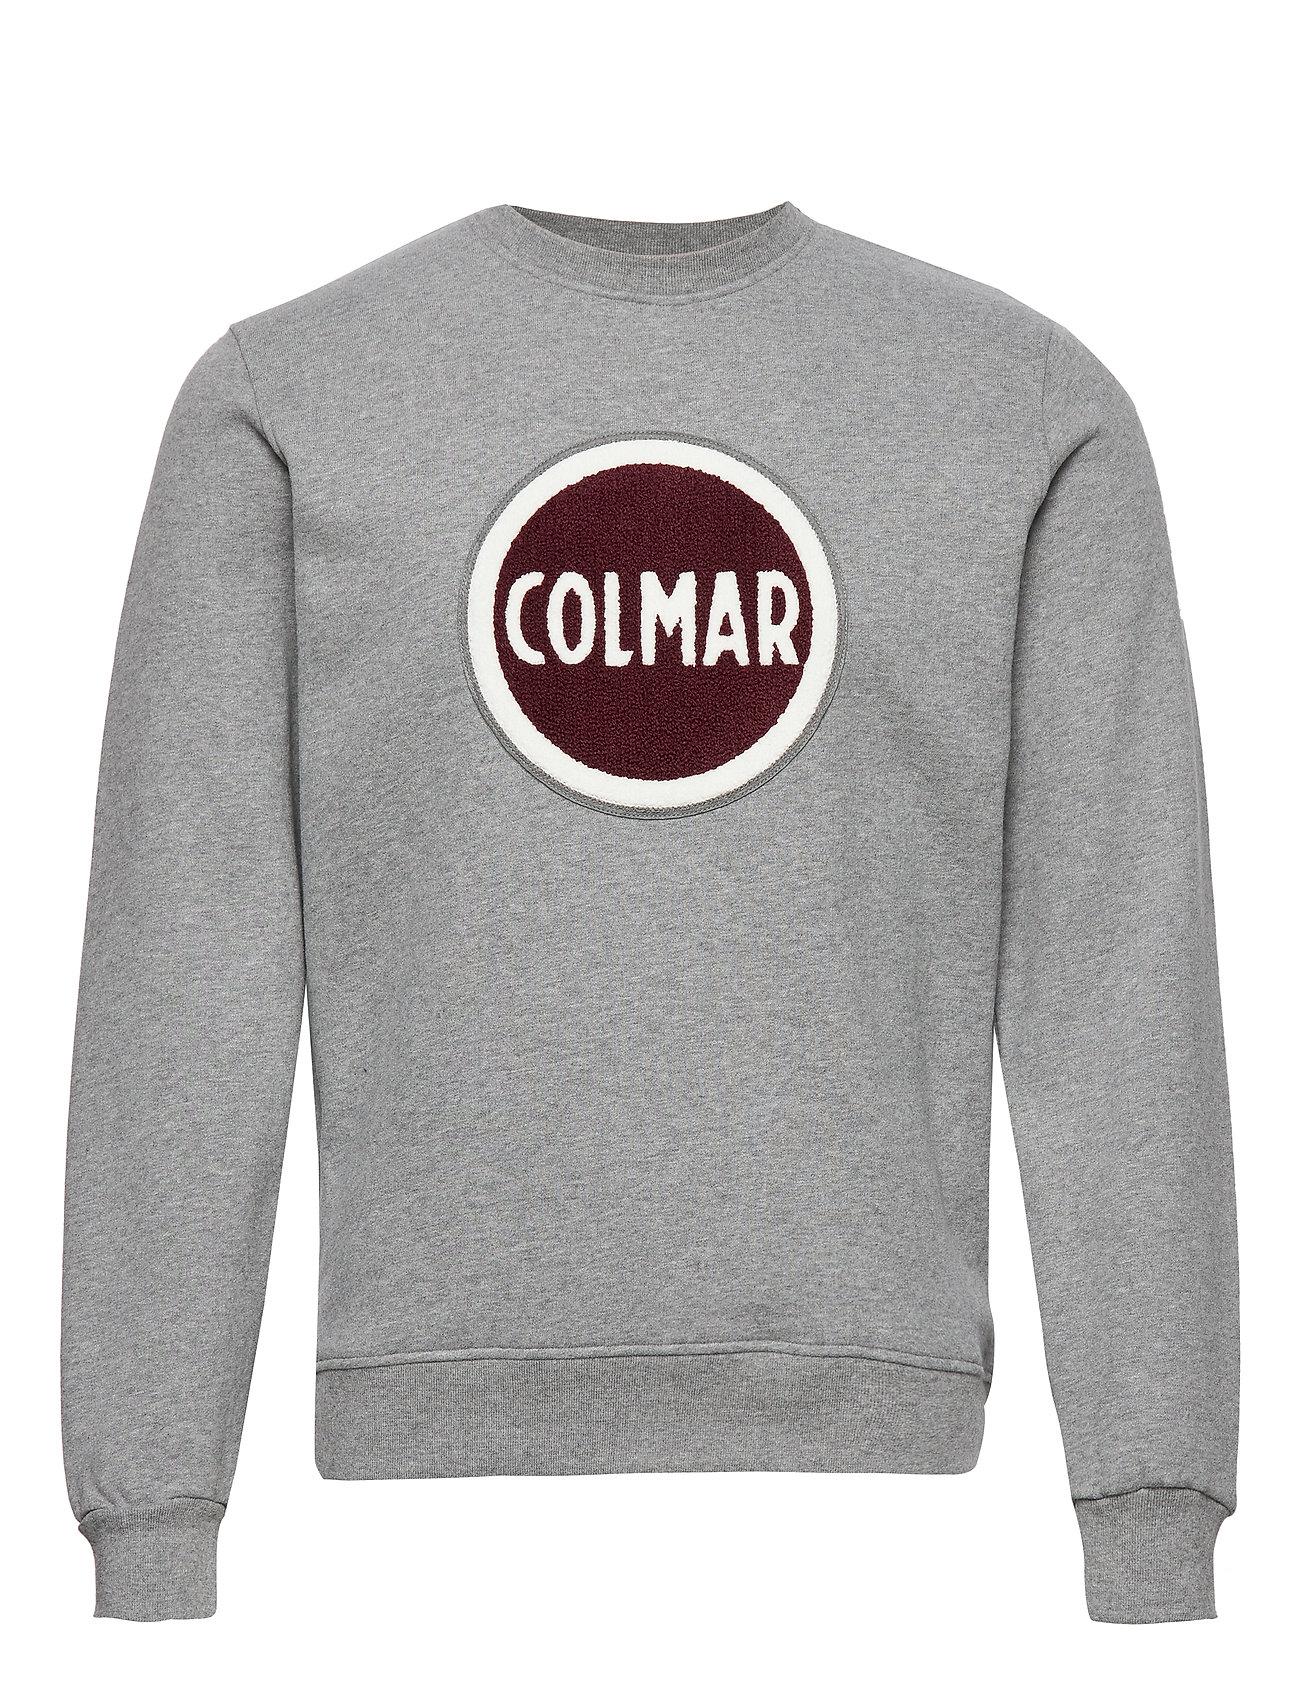 Colmar SWEATSHIRT - 021 MELANGE GREY